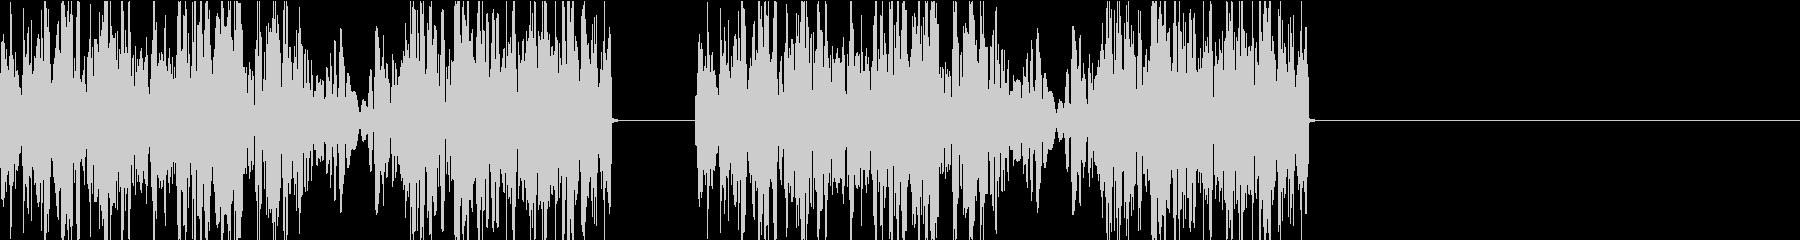 DJプレイ スクラッチ・ノイズ 152の未再生の波形